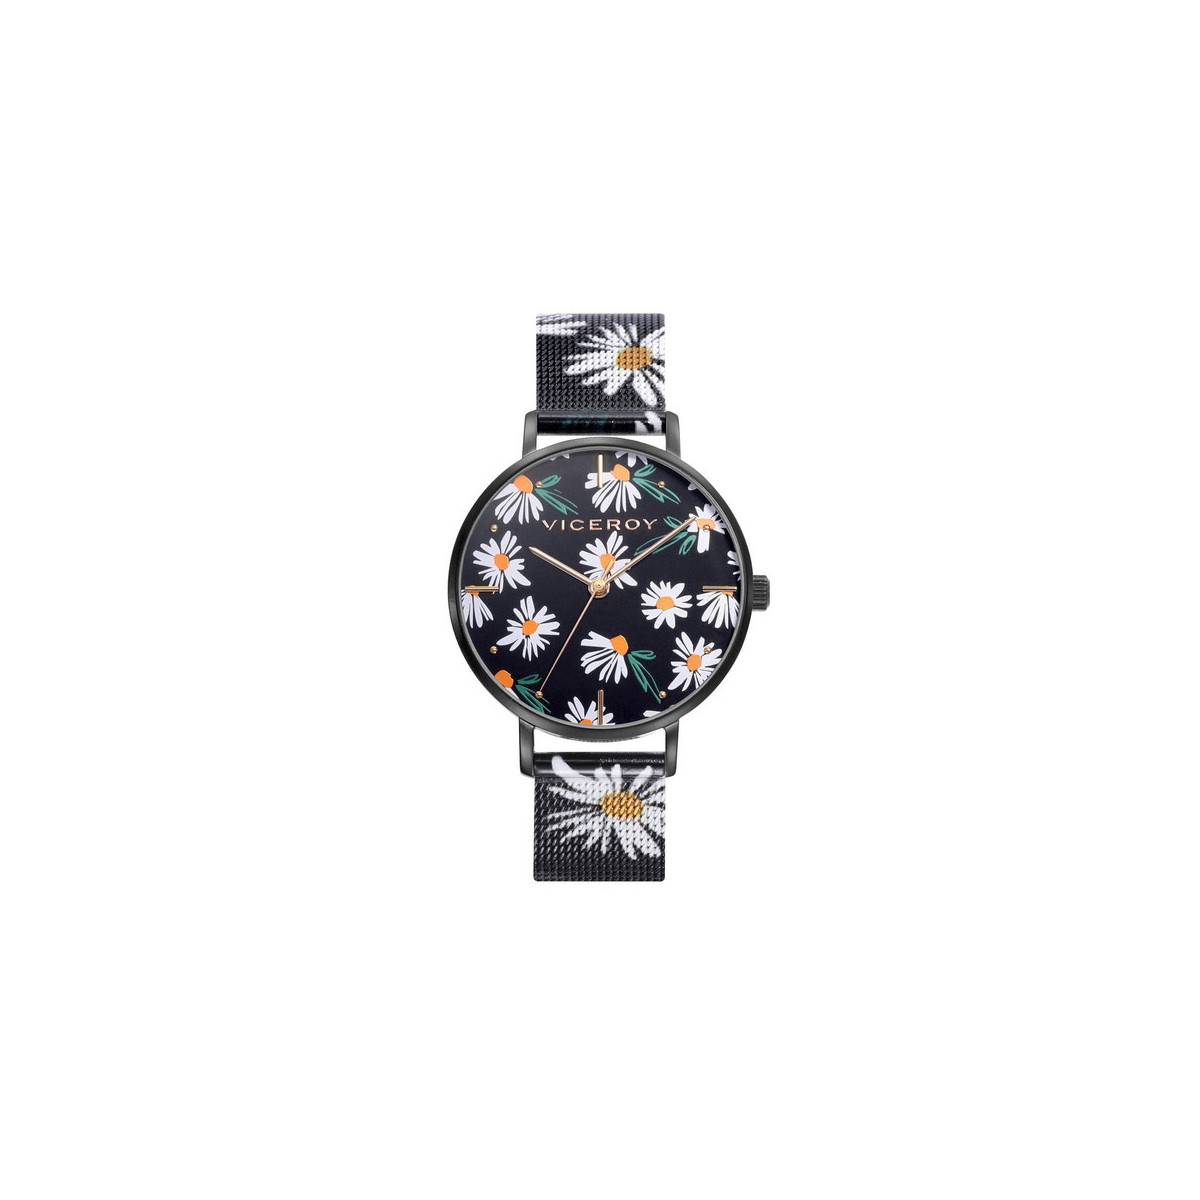 Reloj Viceroy Kiss Margaritas Negro Mujer 401140-57